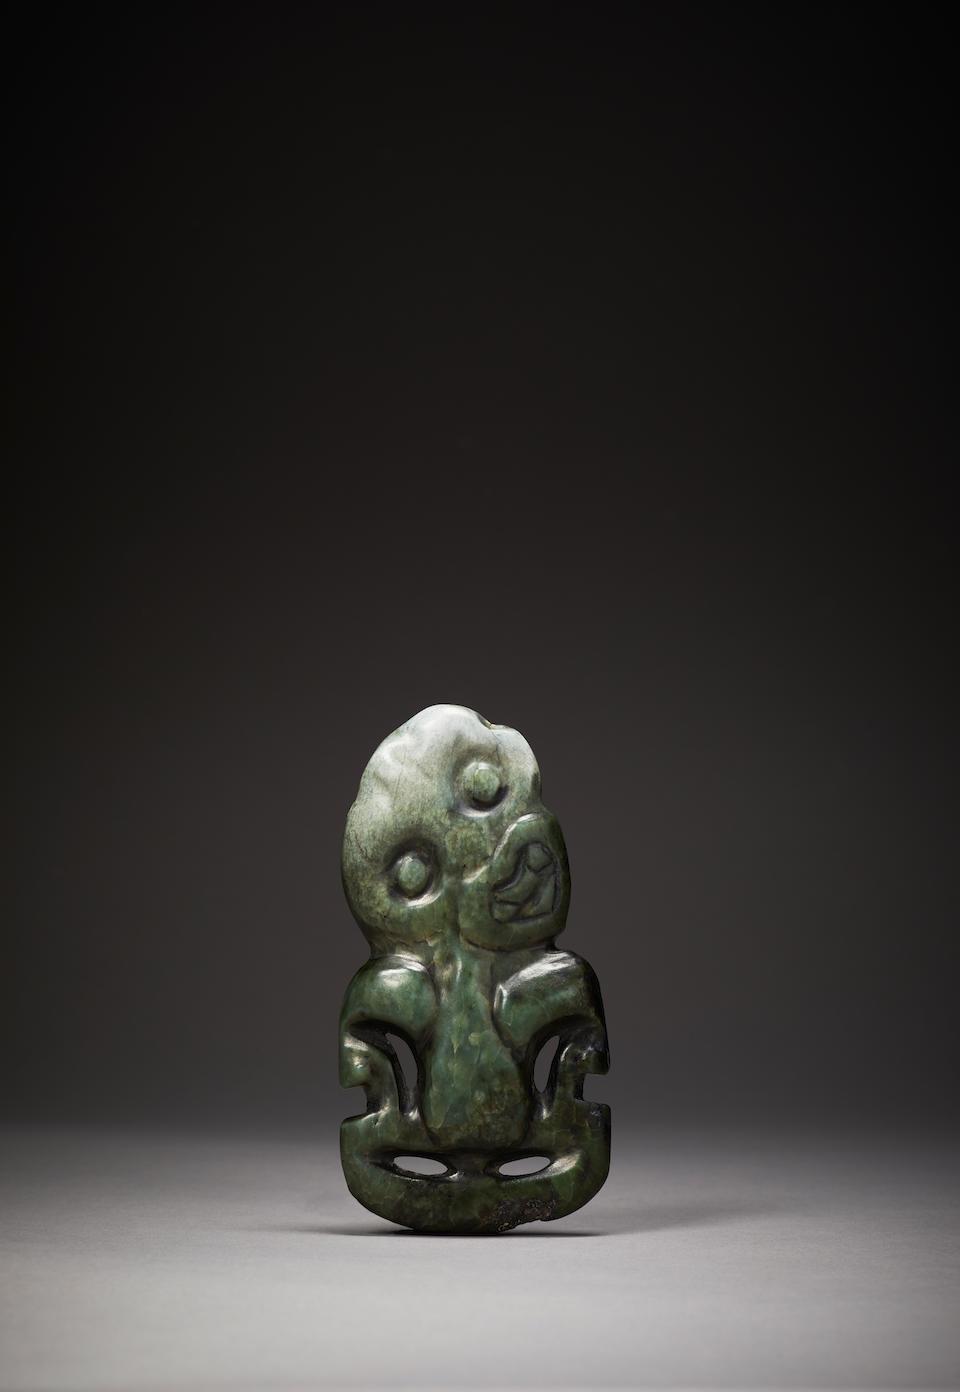 Maori Anthropomorphic Pendant, New Zealand, 1600-1850